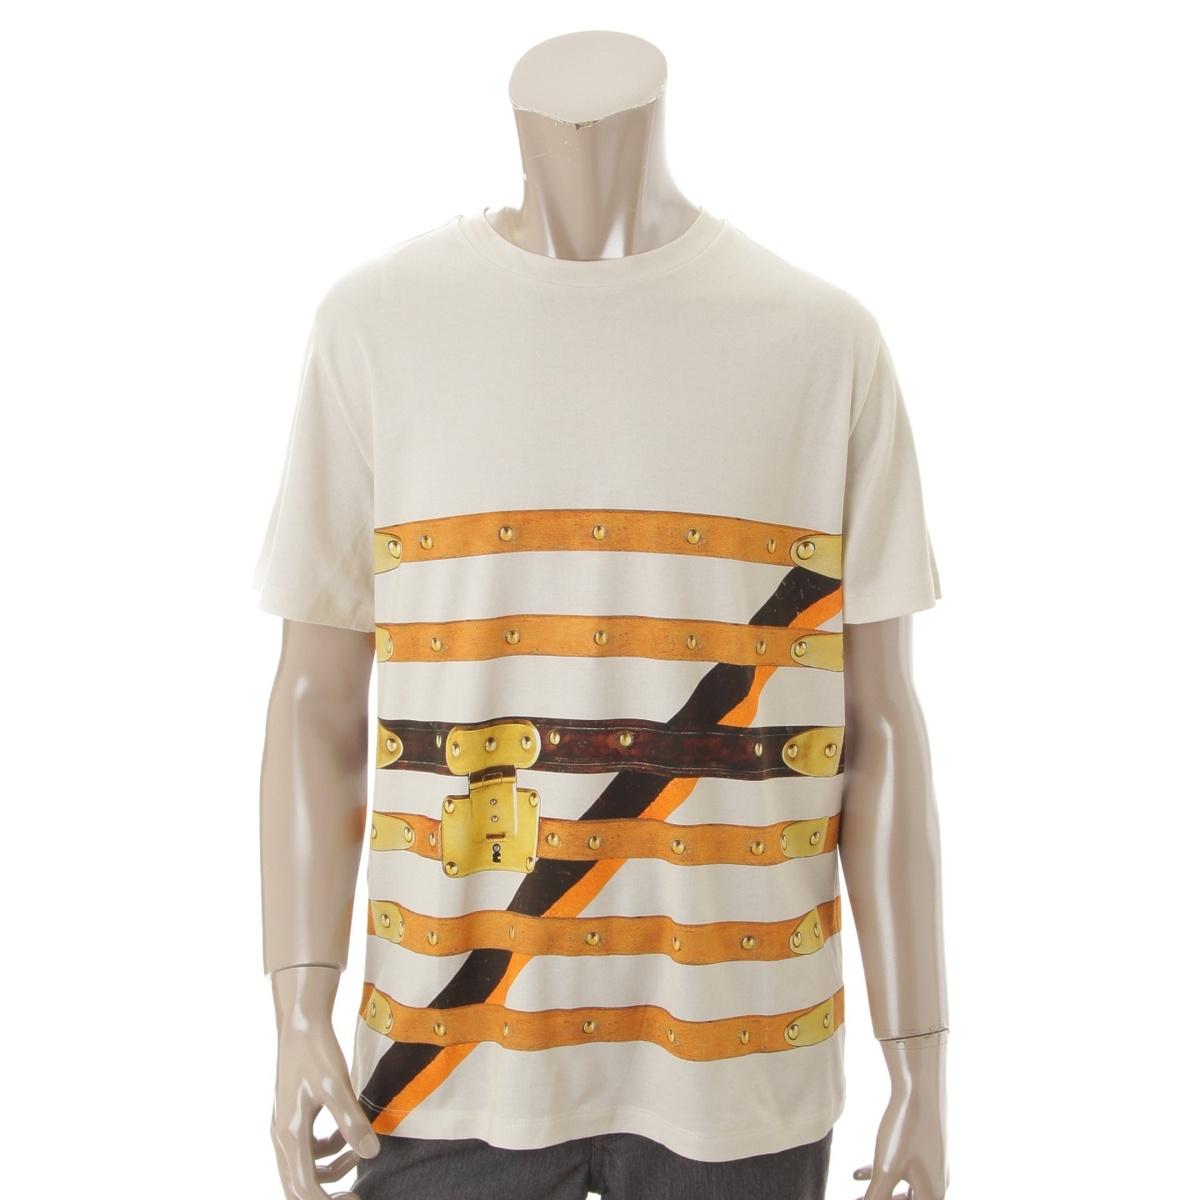 【20%OFFセール】【ルイヴィトン】Louis Vuitton タイムトランク ベルト柄 Tシャツ ホワイト XL 【中古】【鑑定済・正規品保証】72063